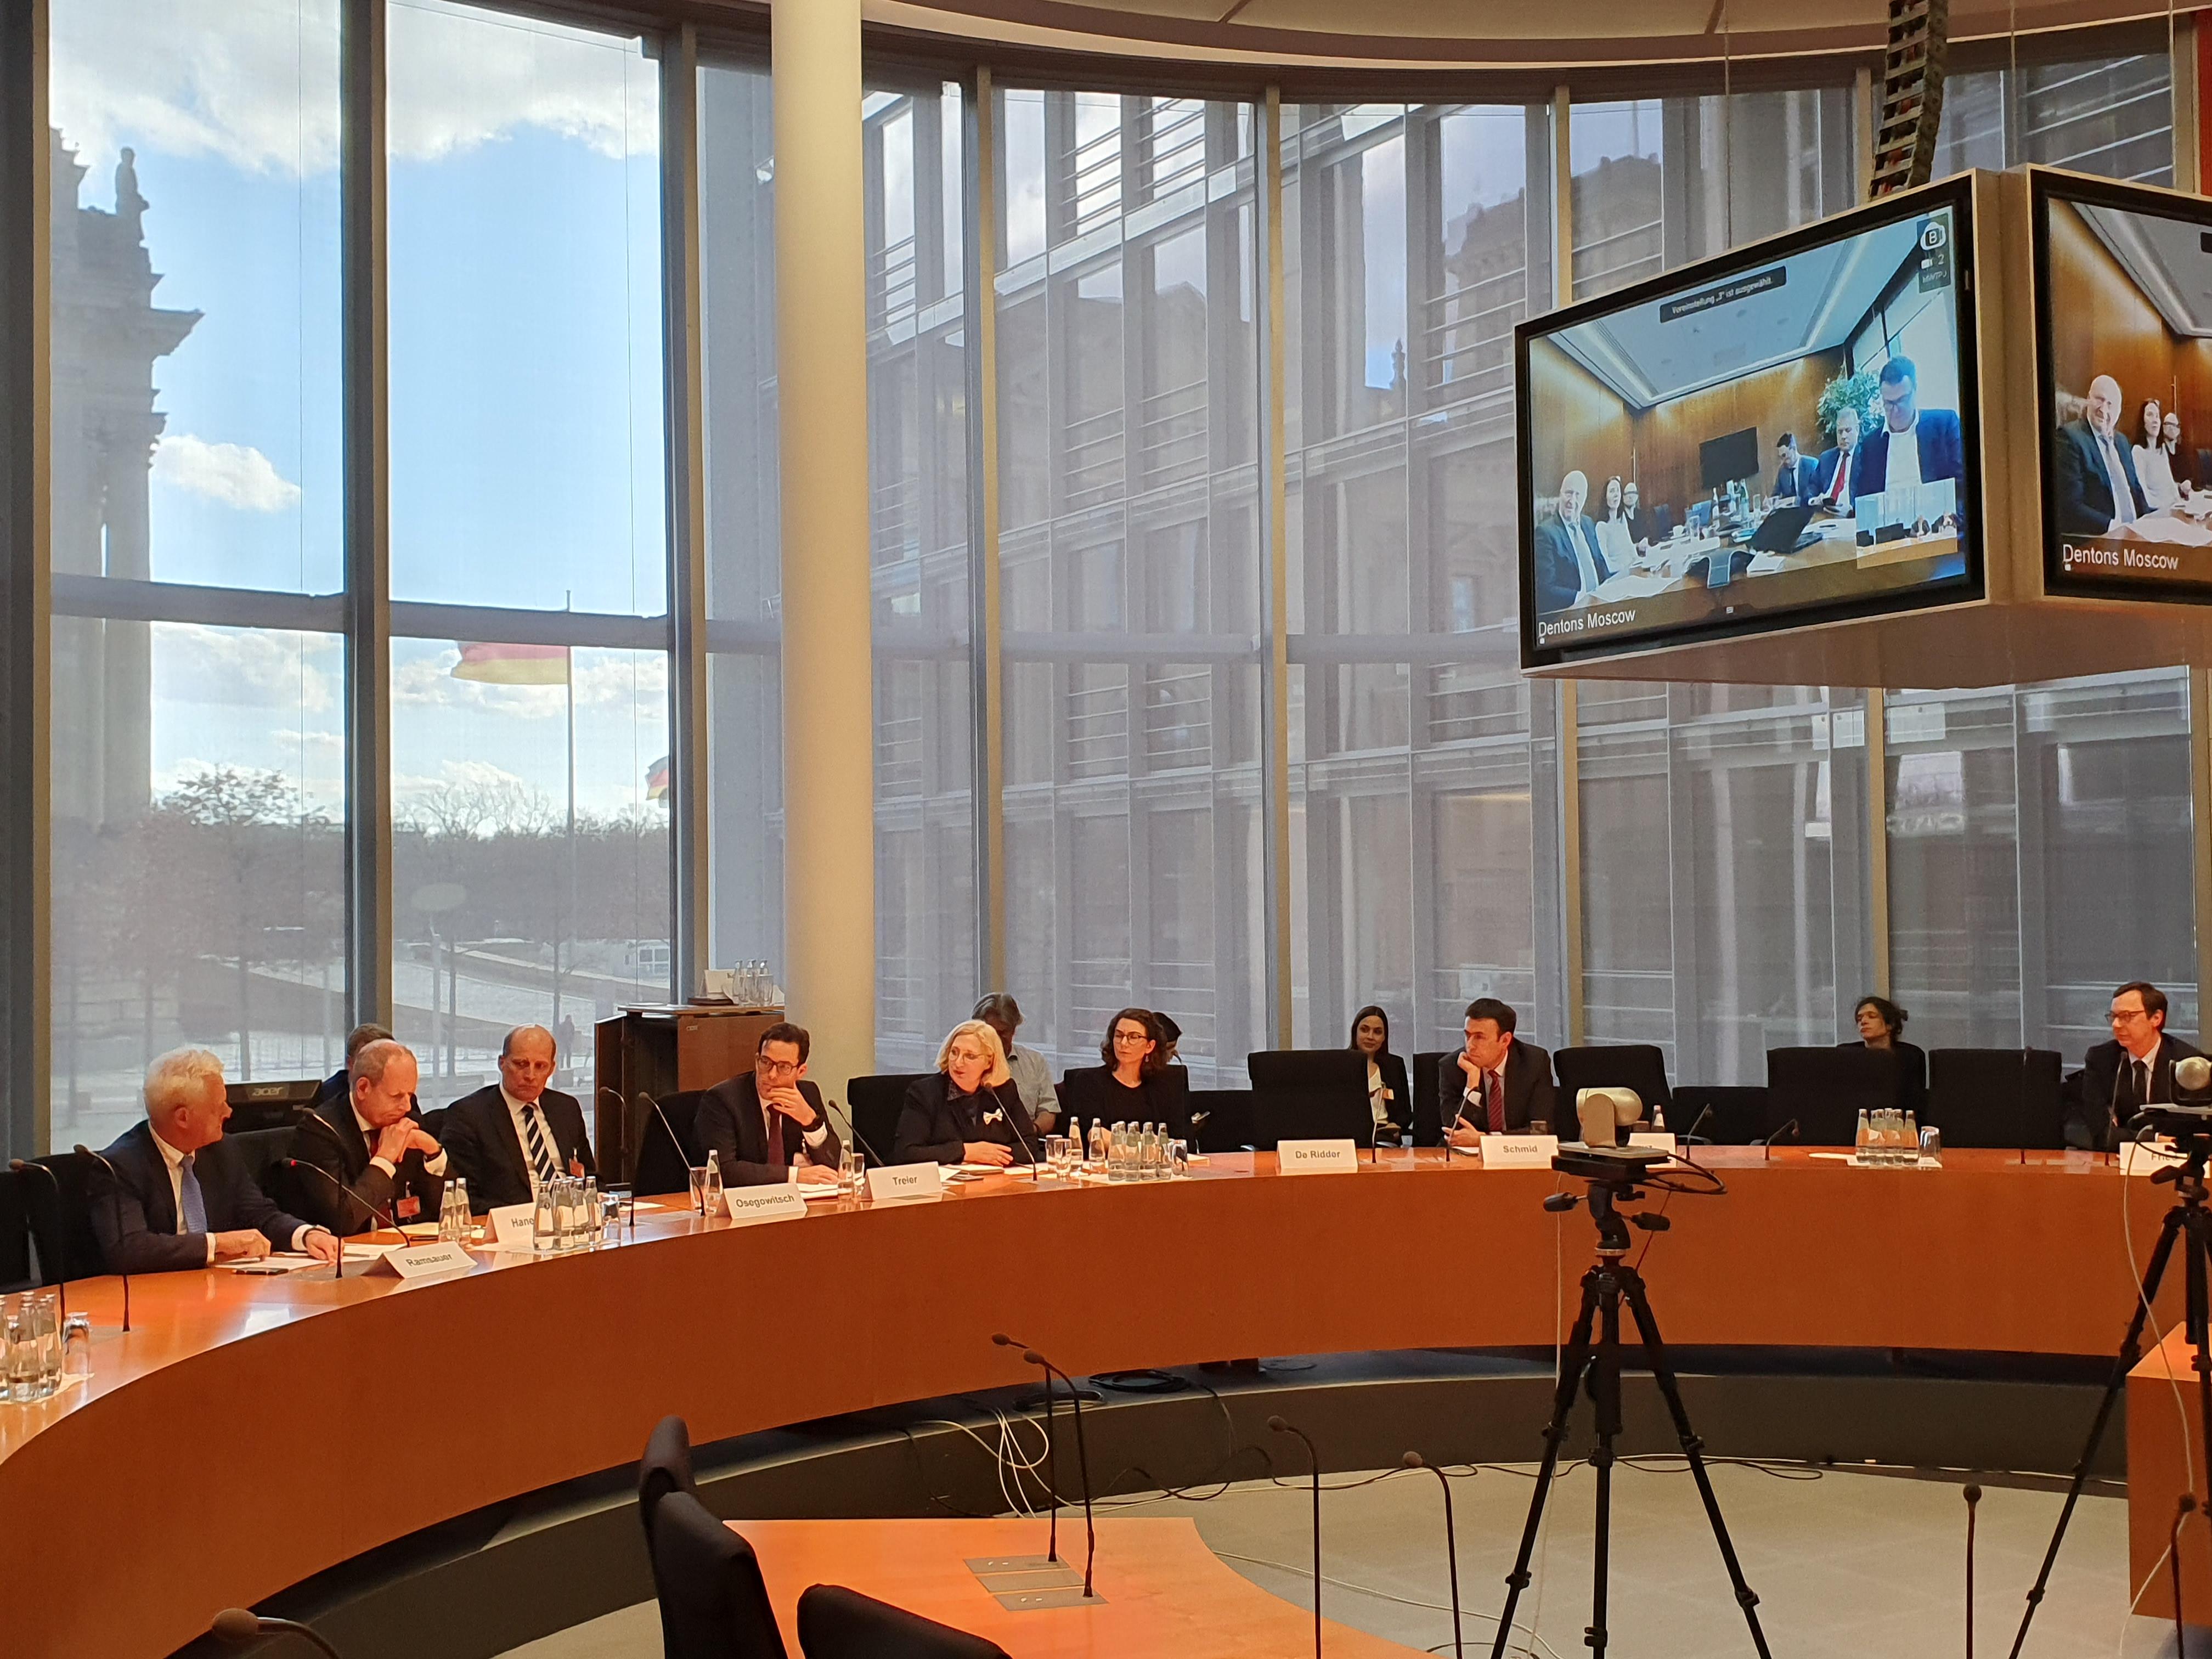 Dr. Daniela De Ridder beim Runden Tisch der DIHK